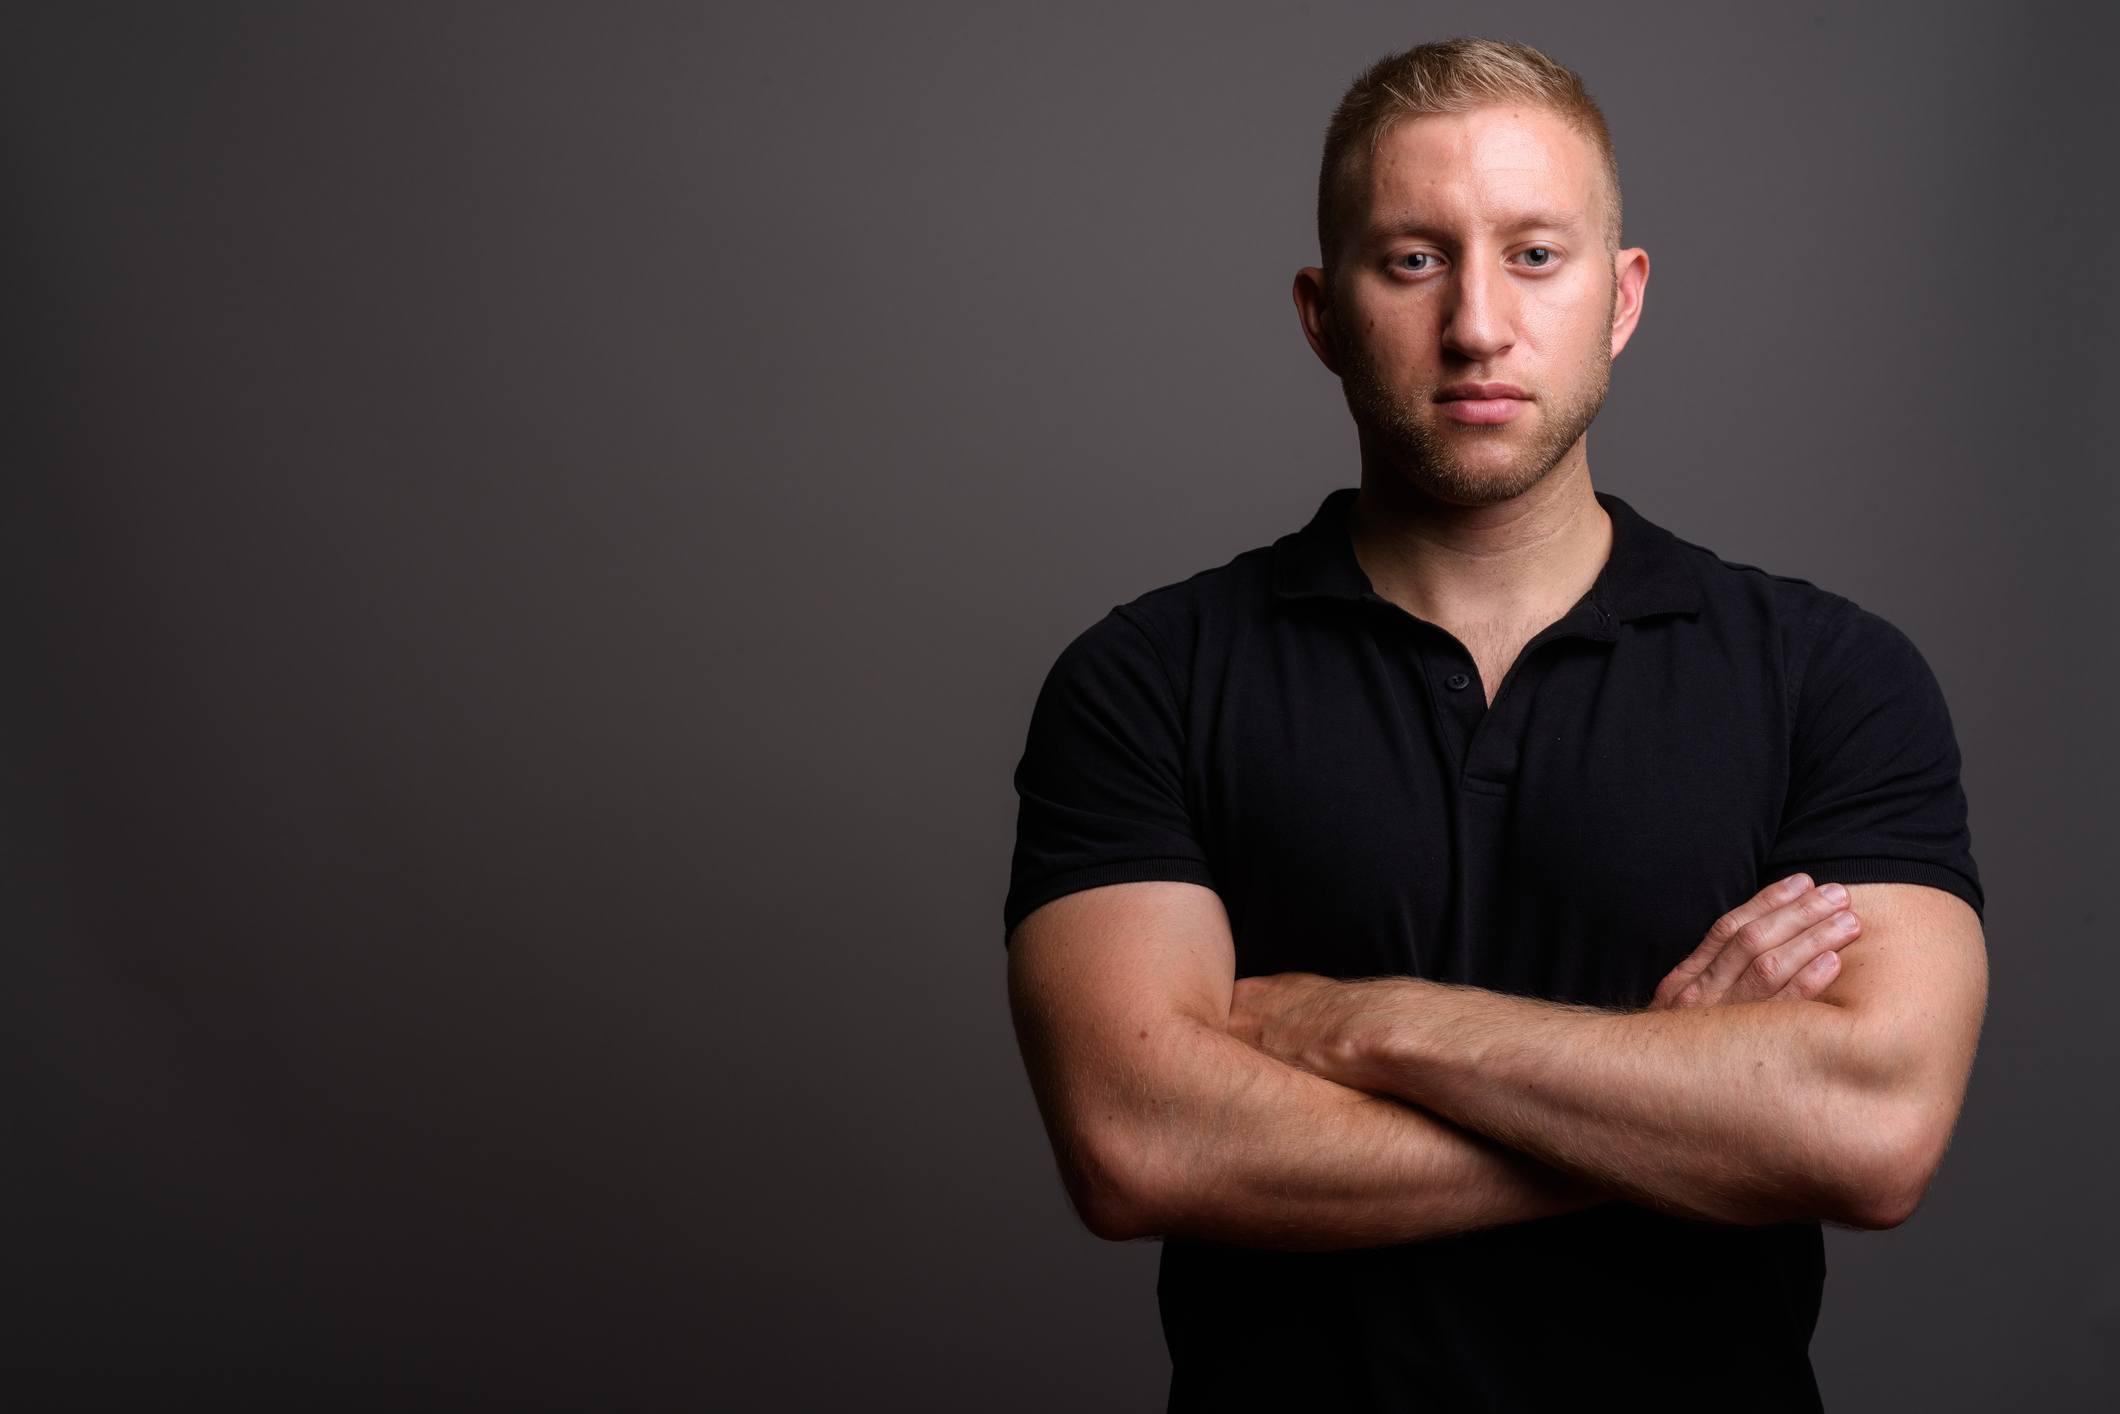 Man with black polo shirt